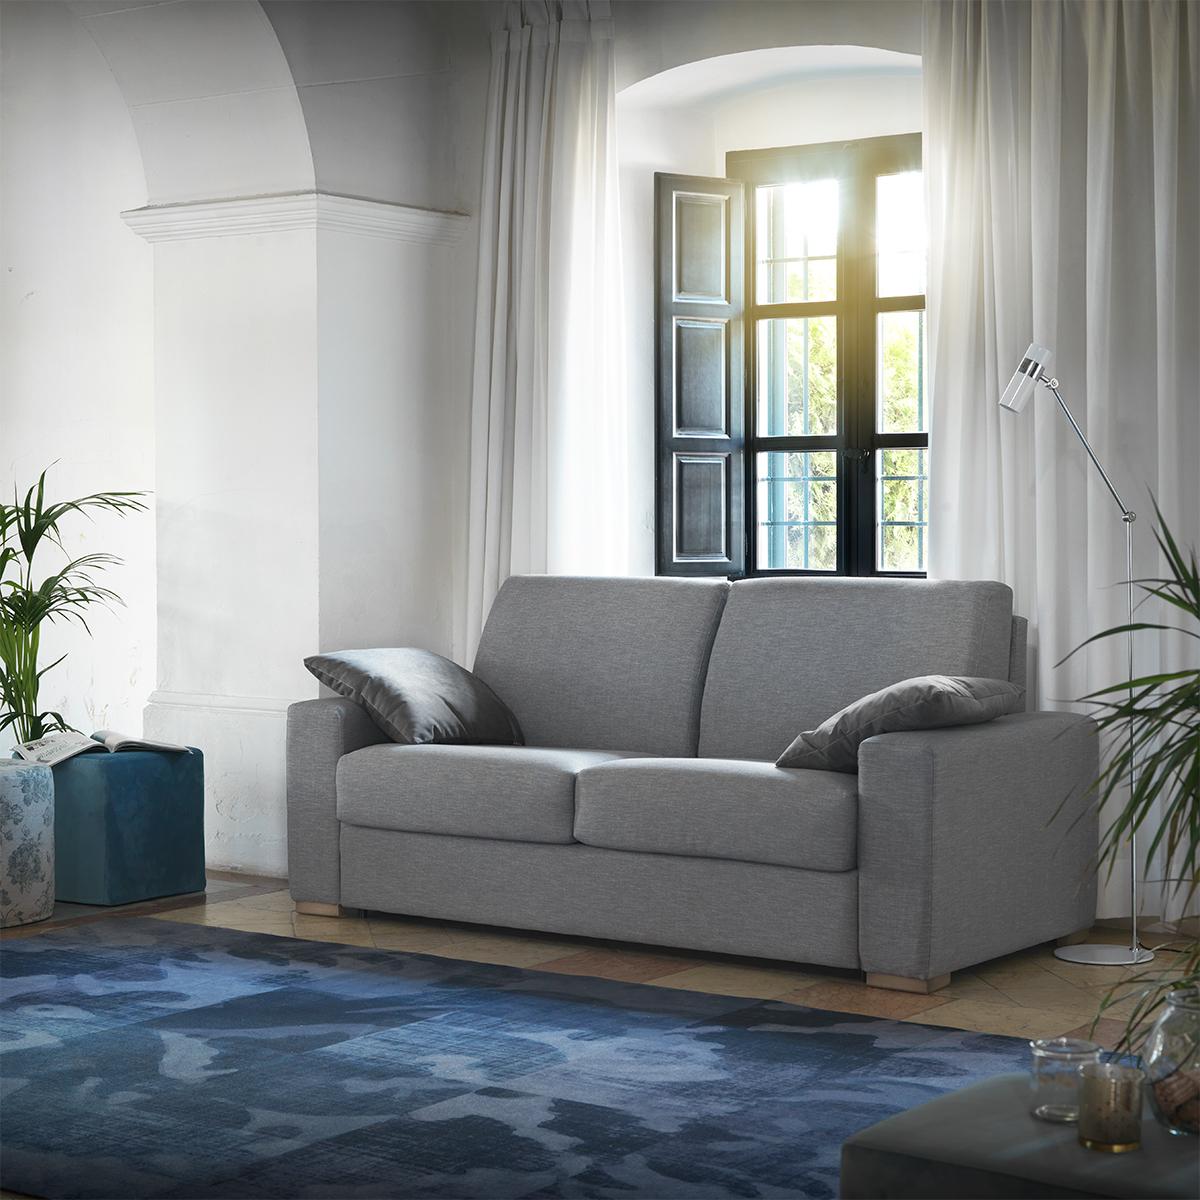 Modernūs minkšti svetainės baldai sofa lova Nix 1